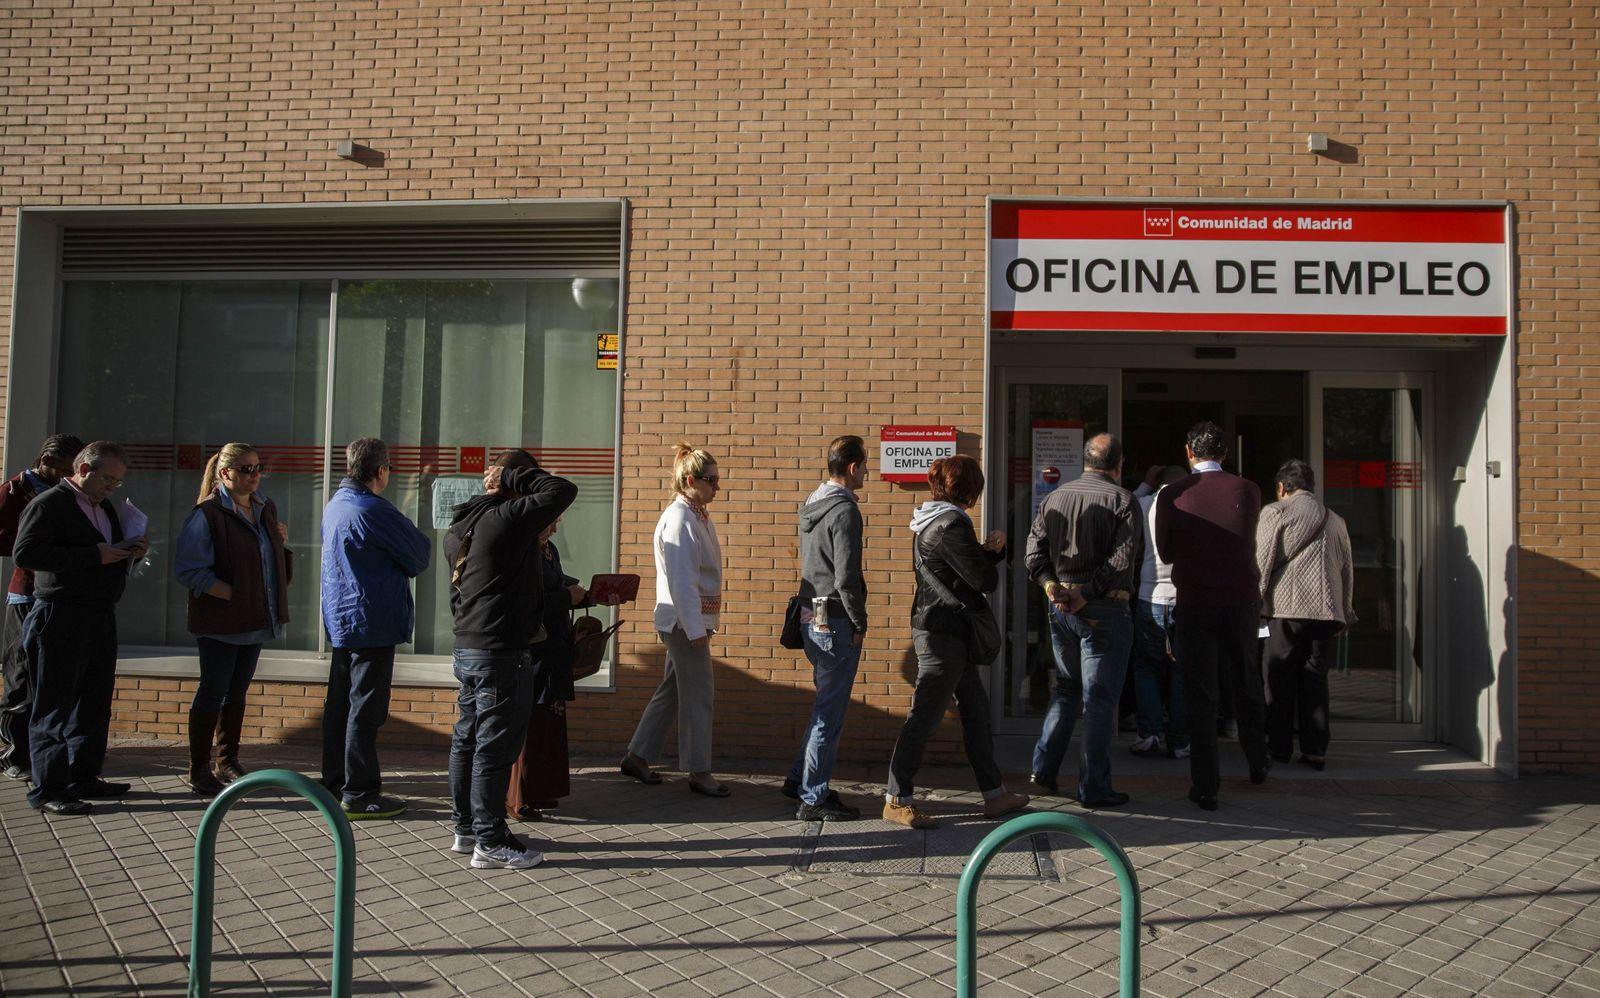 SPAIN-ECONOMY/UNEMPLOYMENT